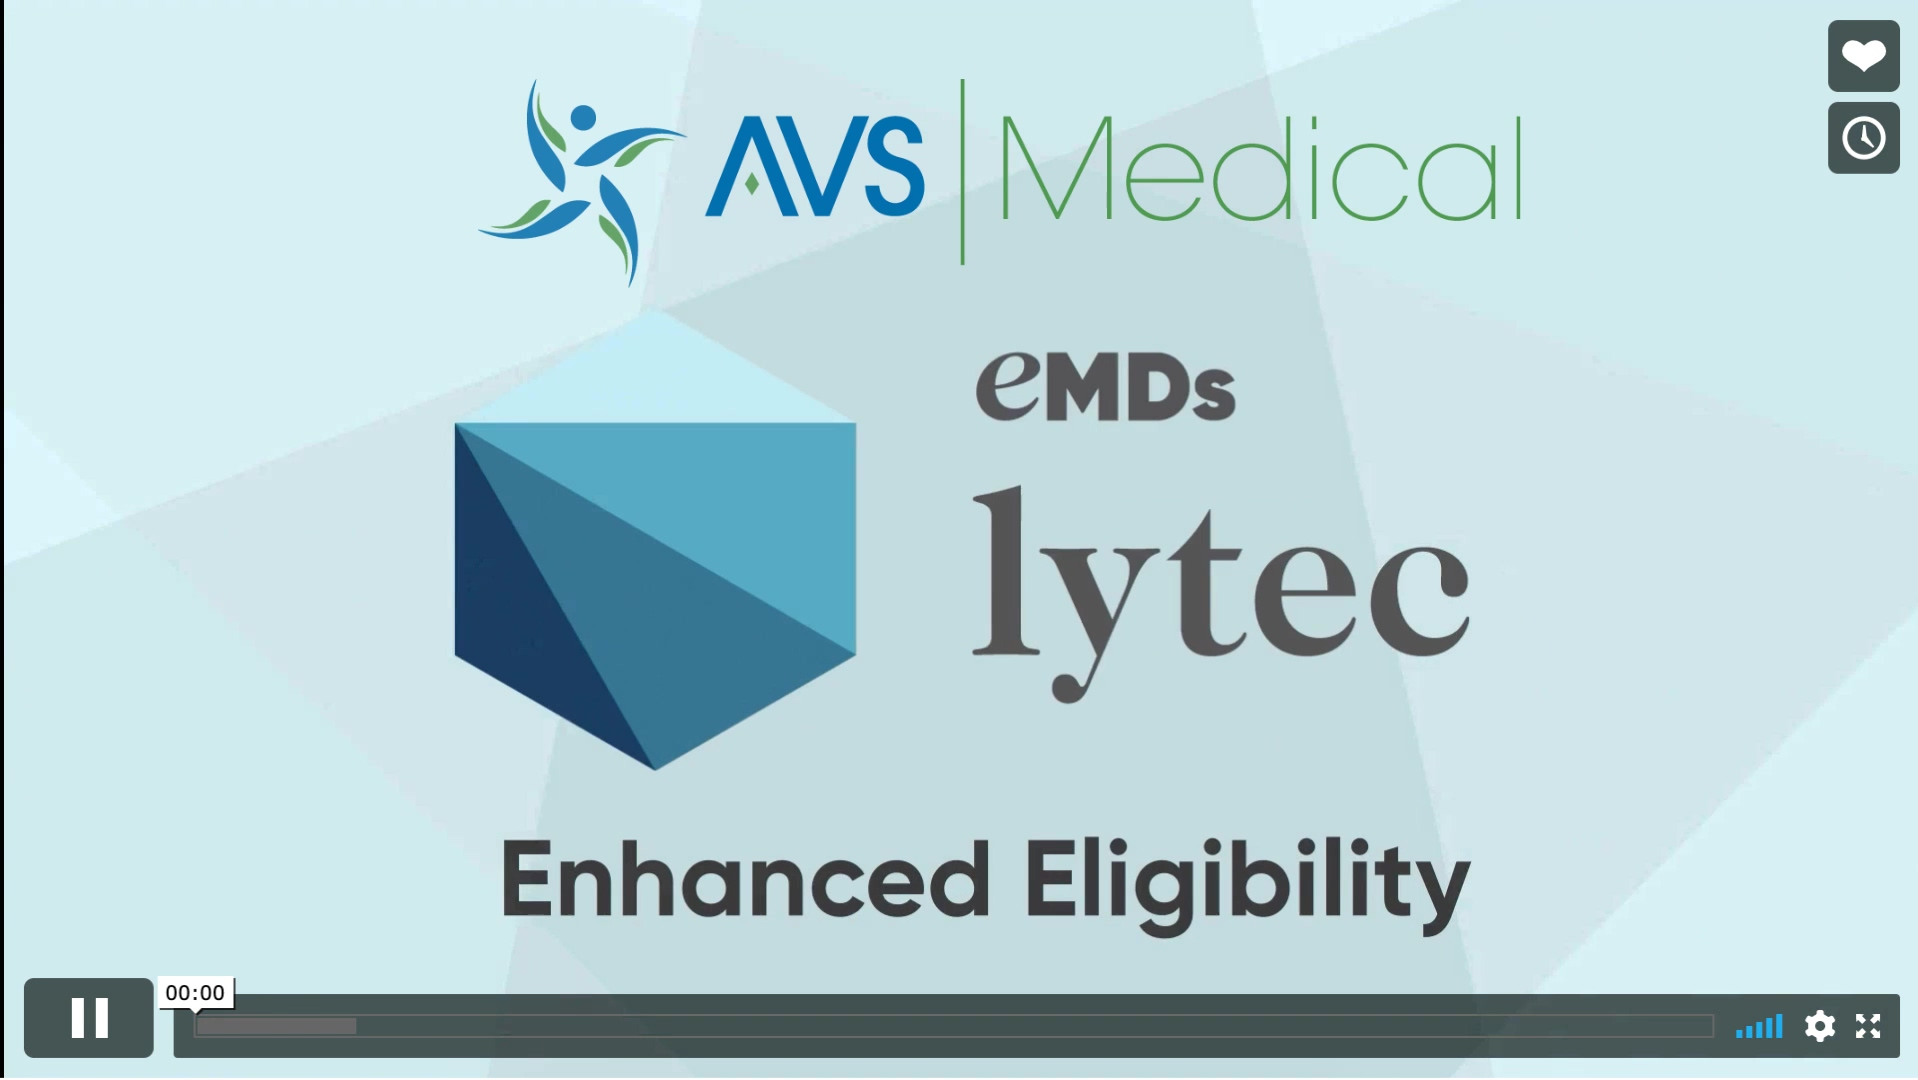 Lytec 2020 Enhance Eligibility Display_AVS